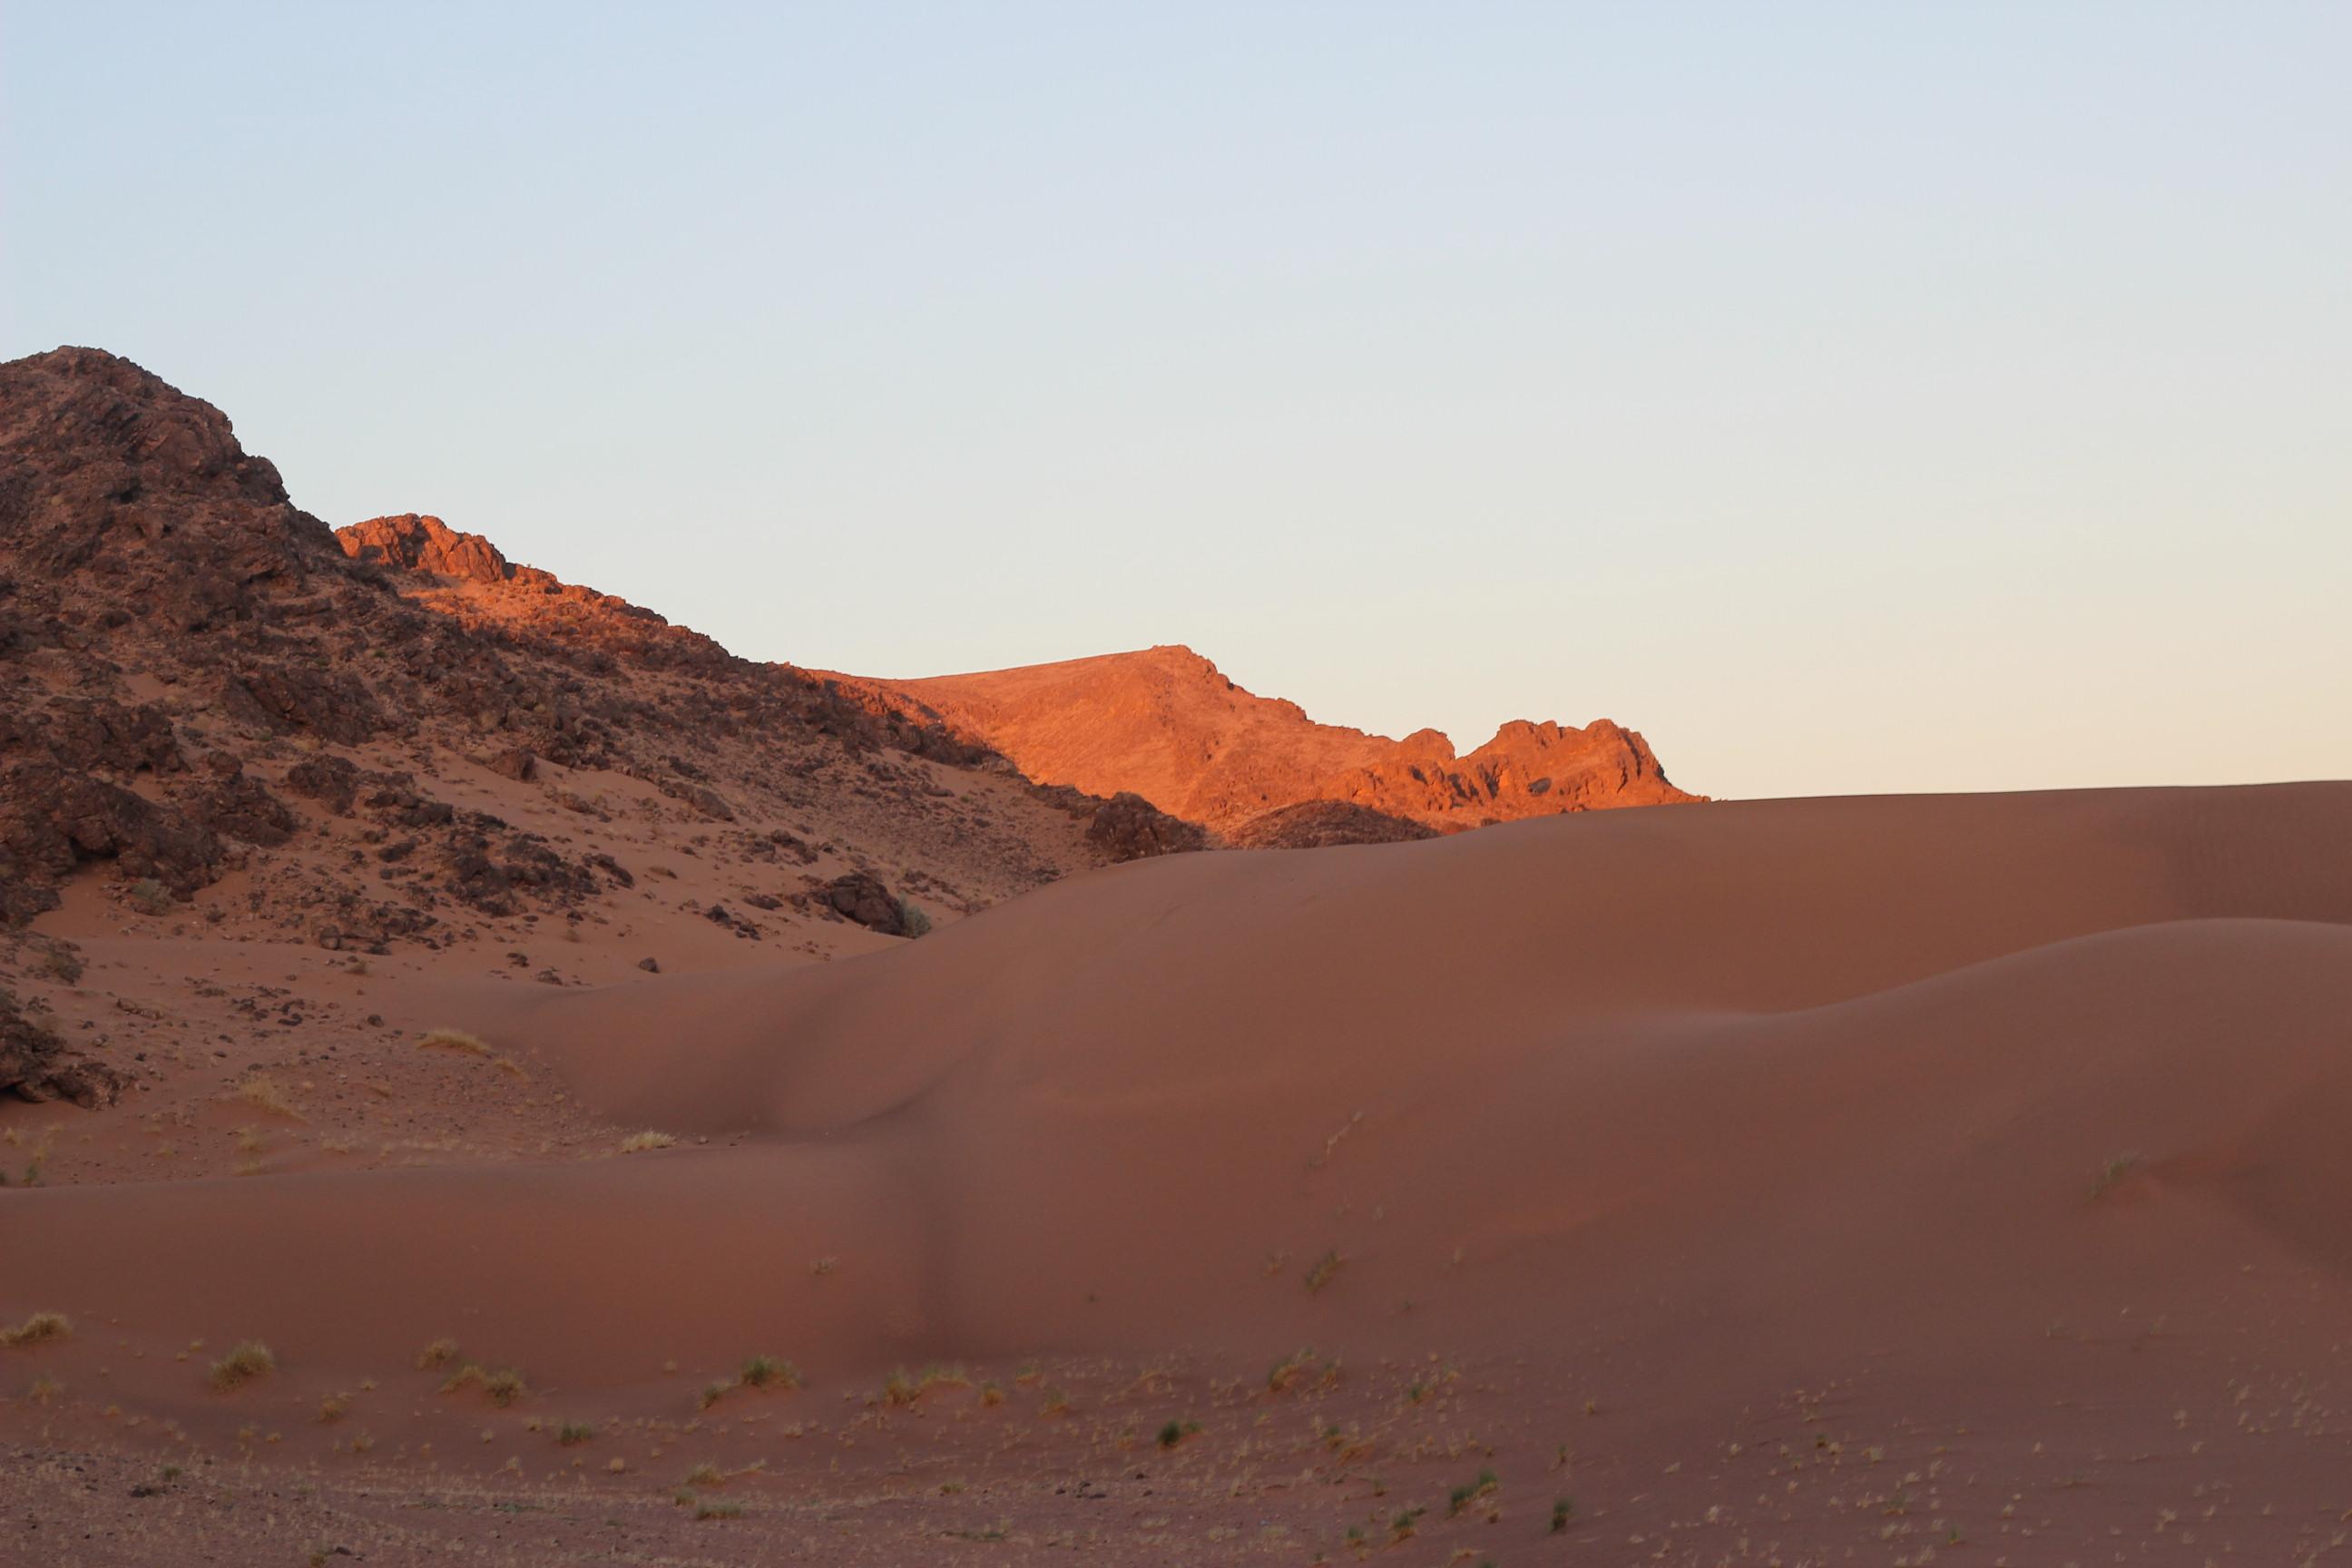 Zwillingsratgeber IMG_5987 Marokko Urlaub - Zwei Frauen unterwegs